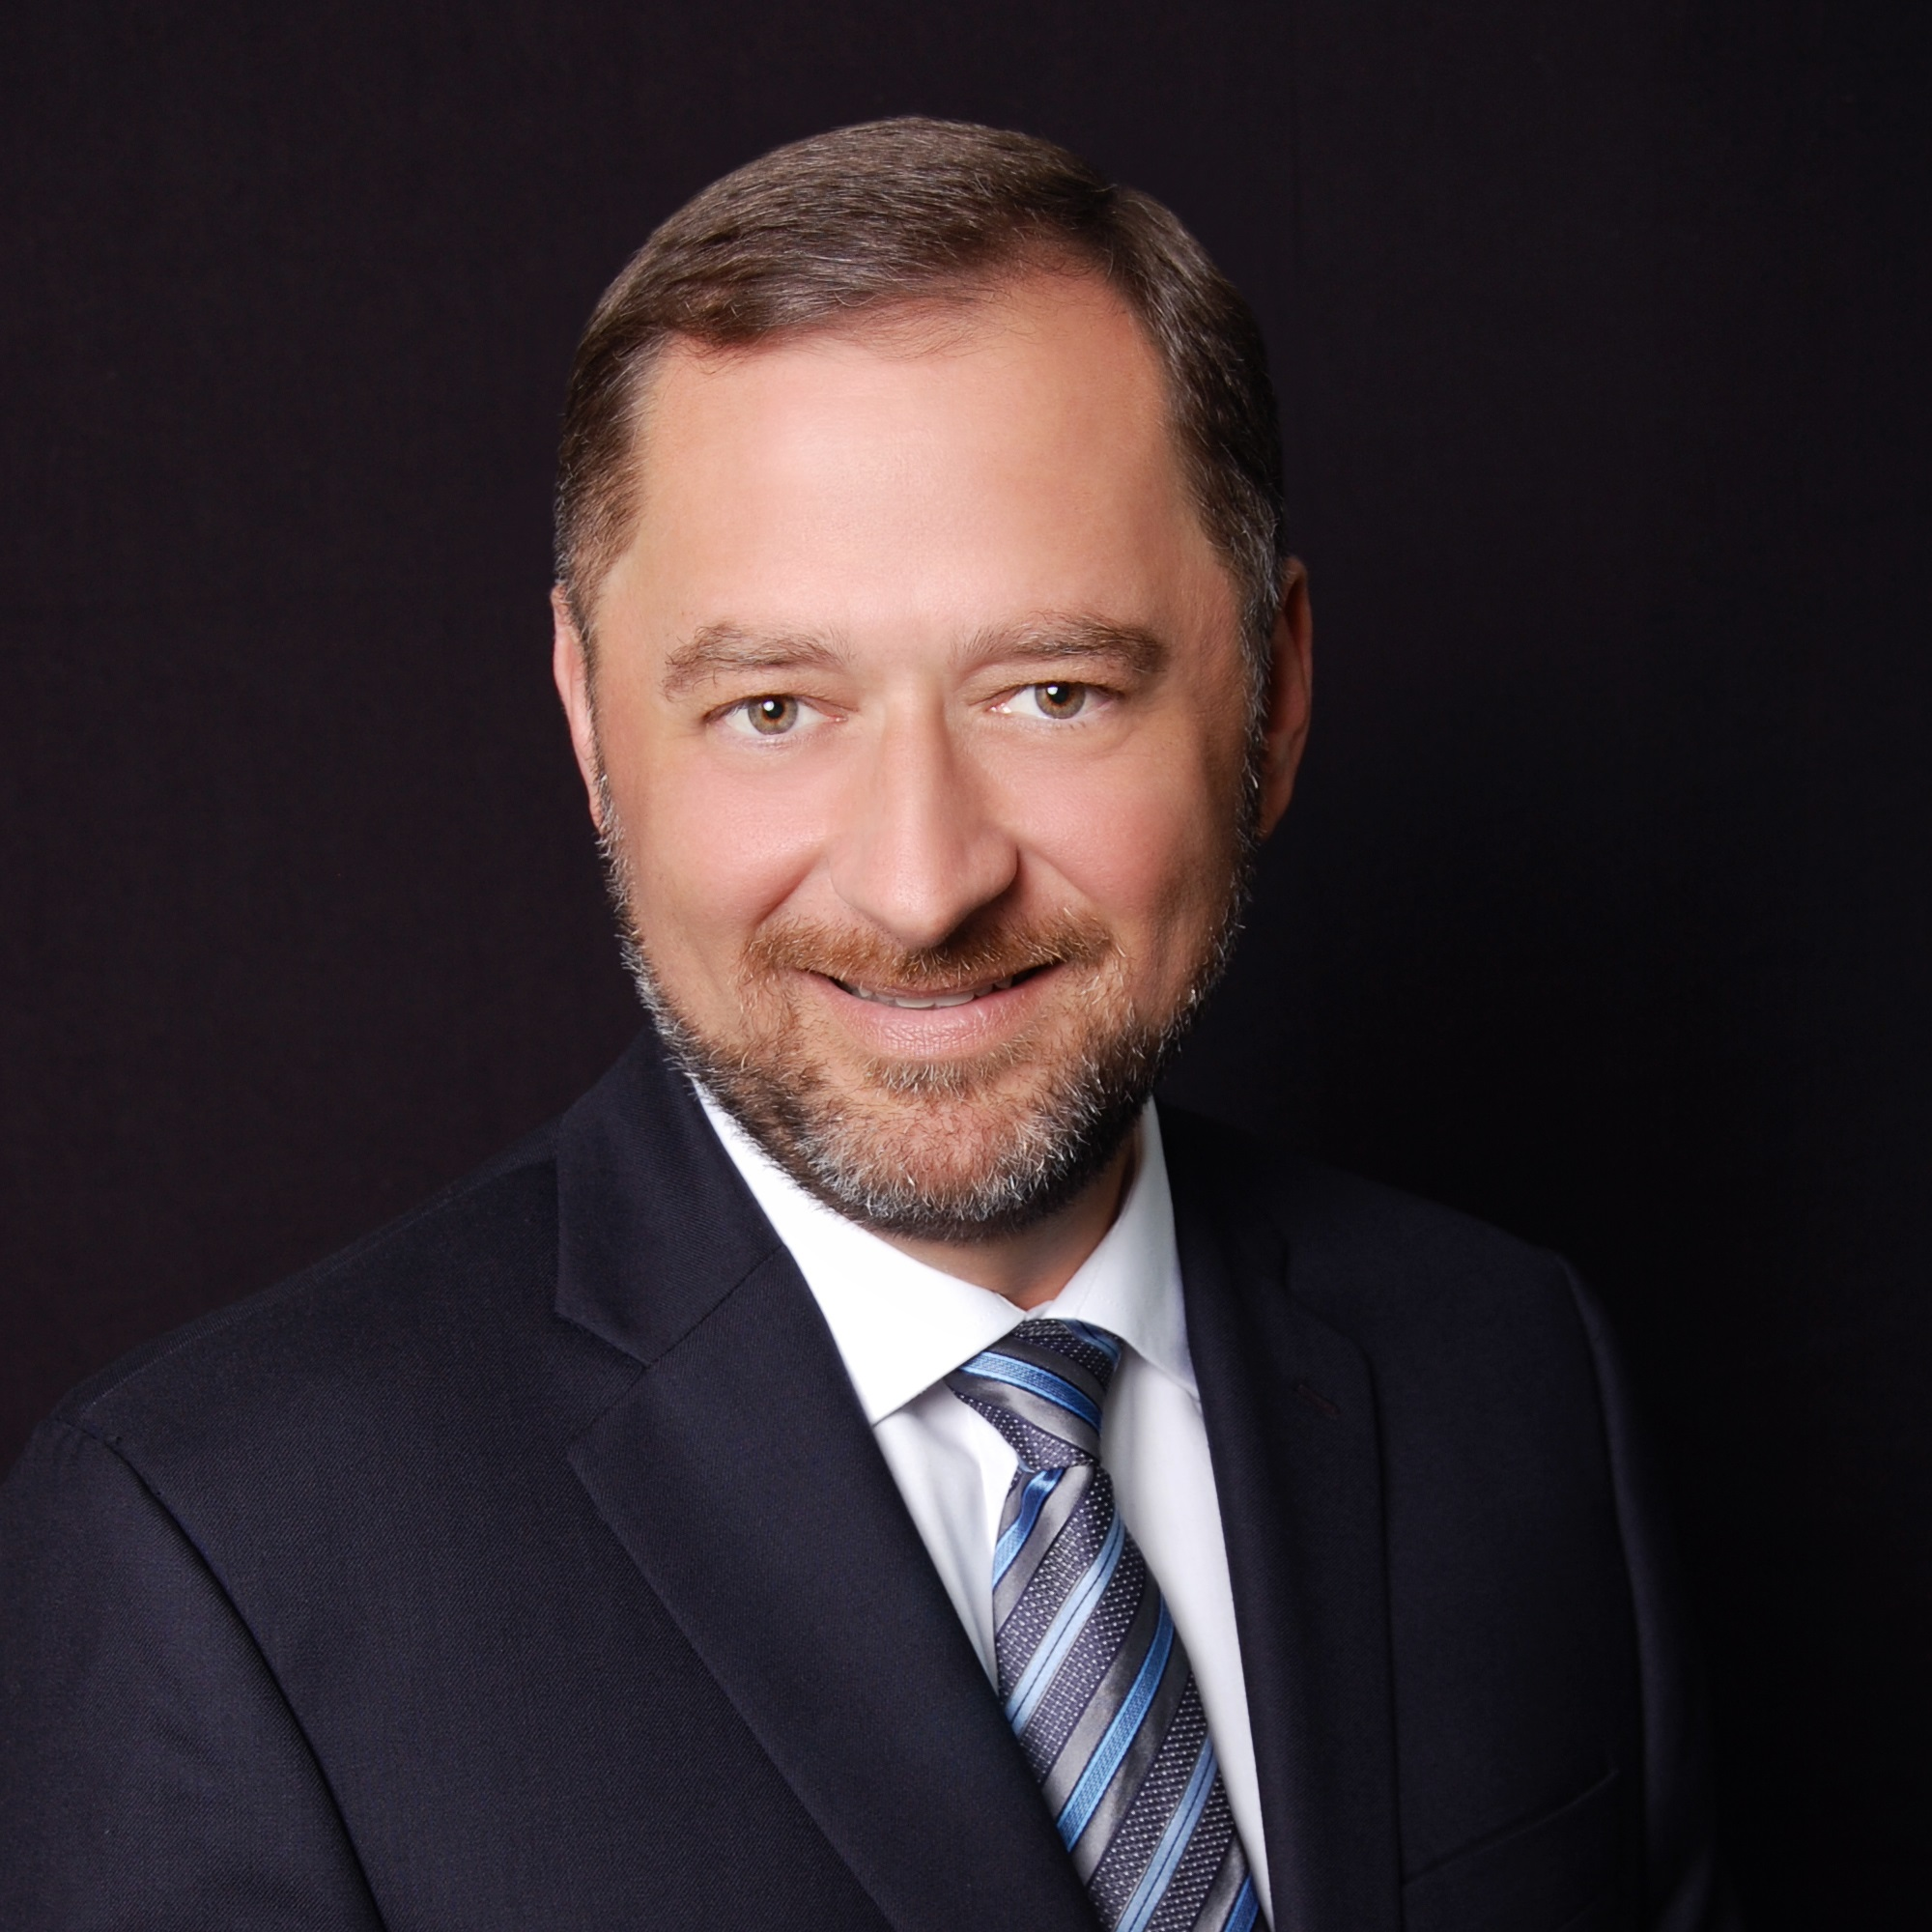 John Milakovic